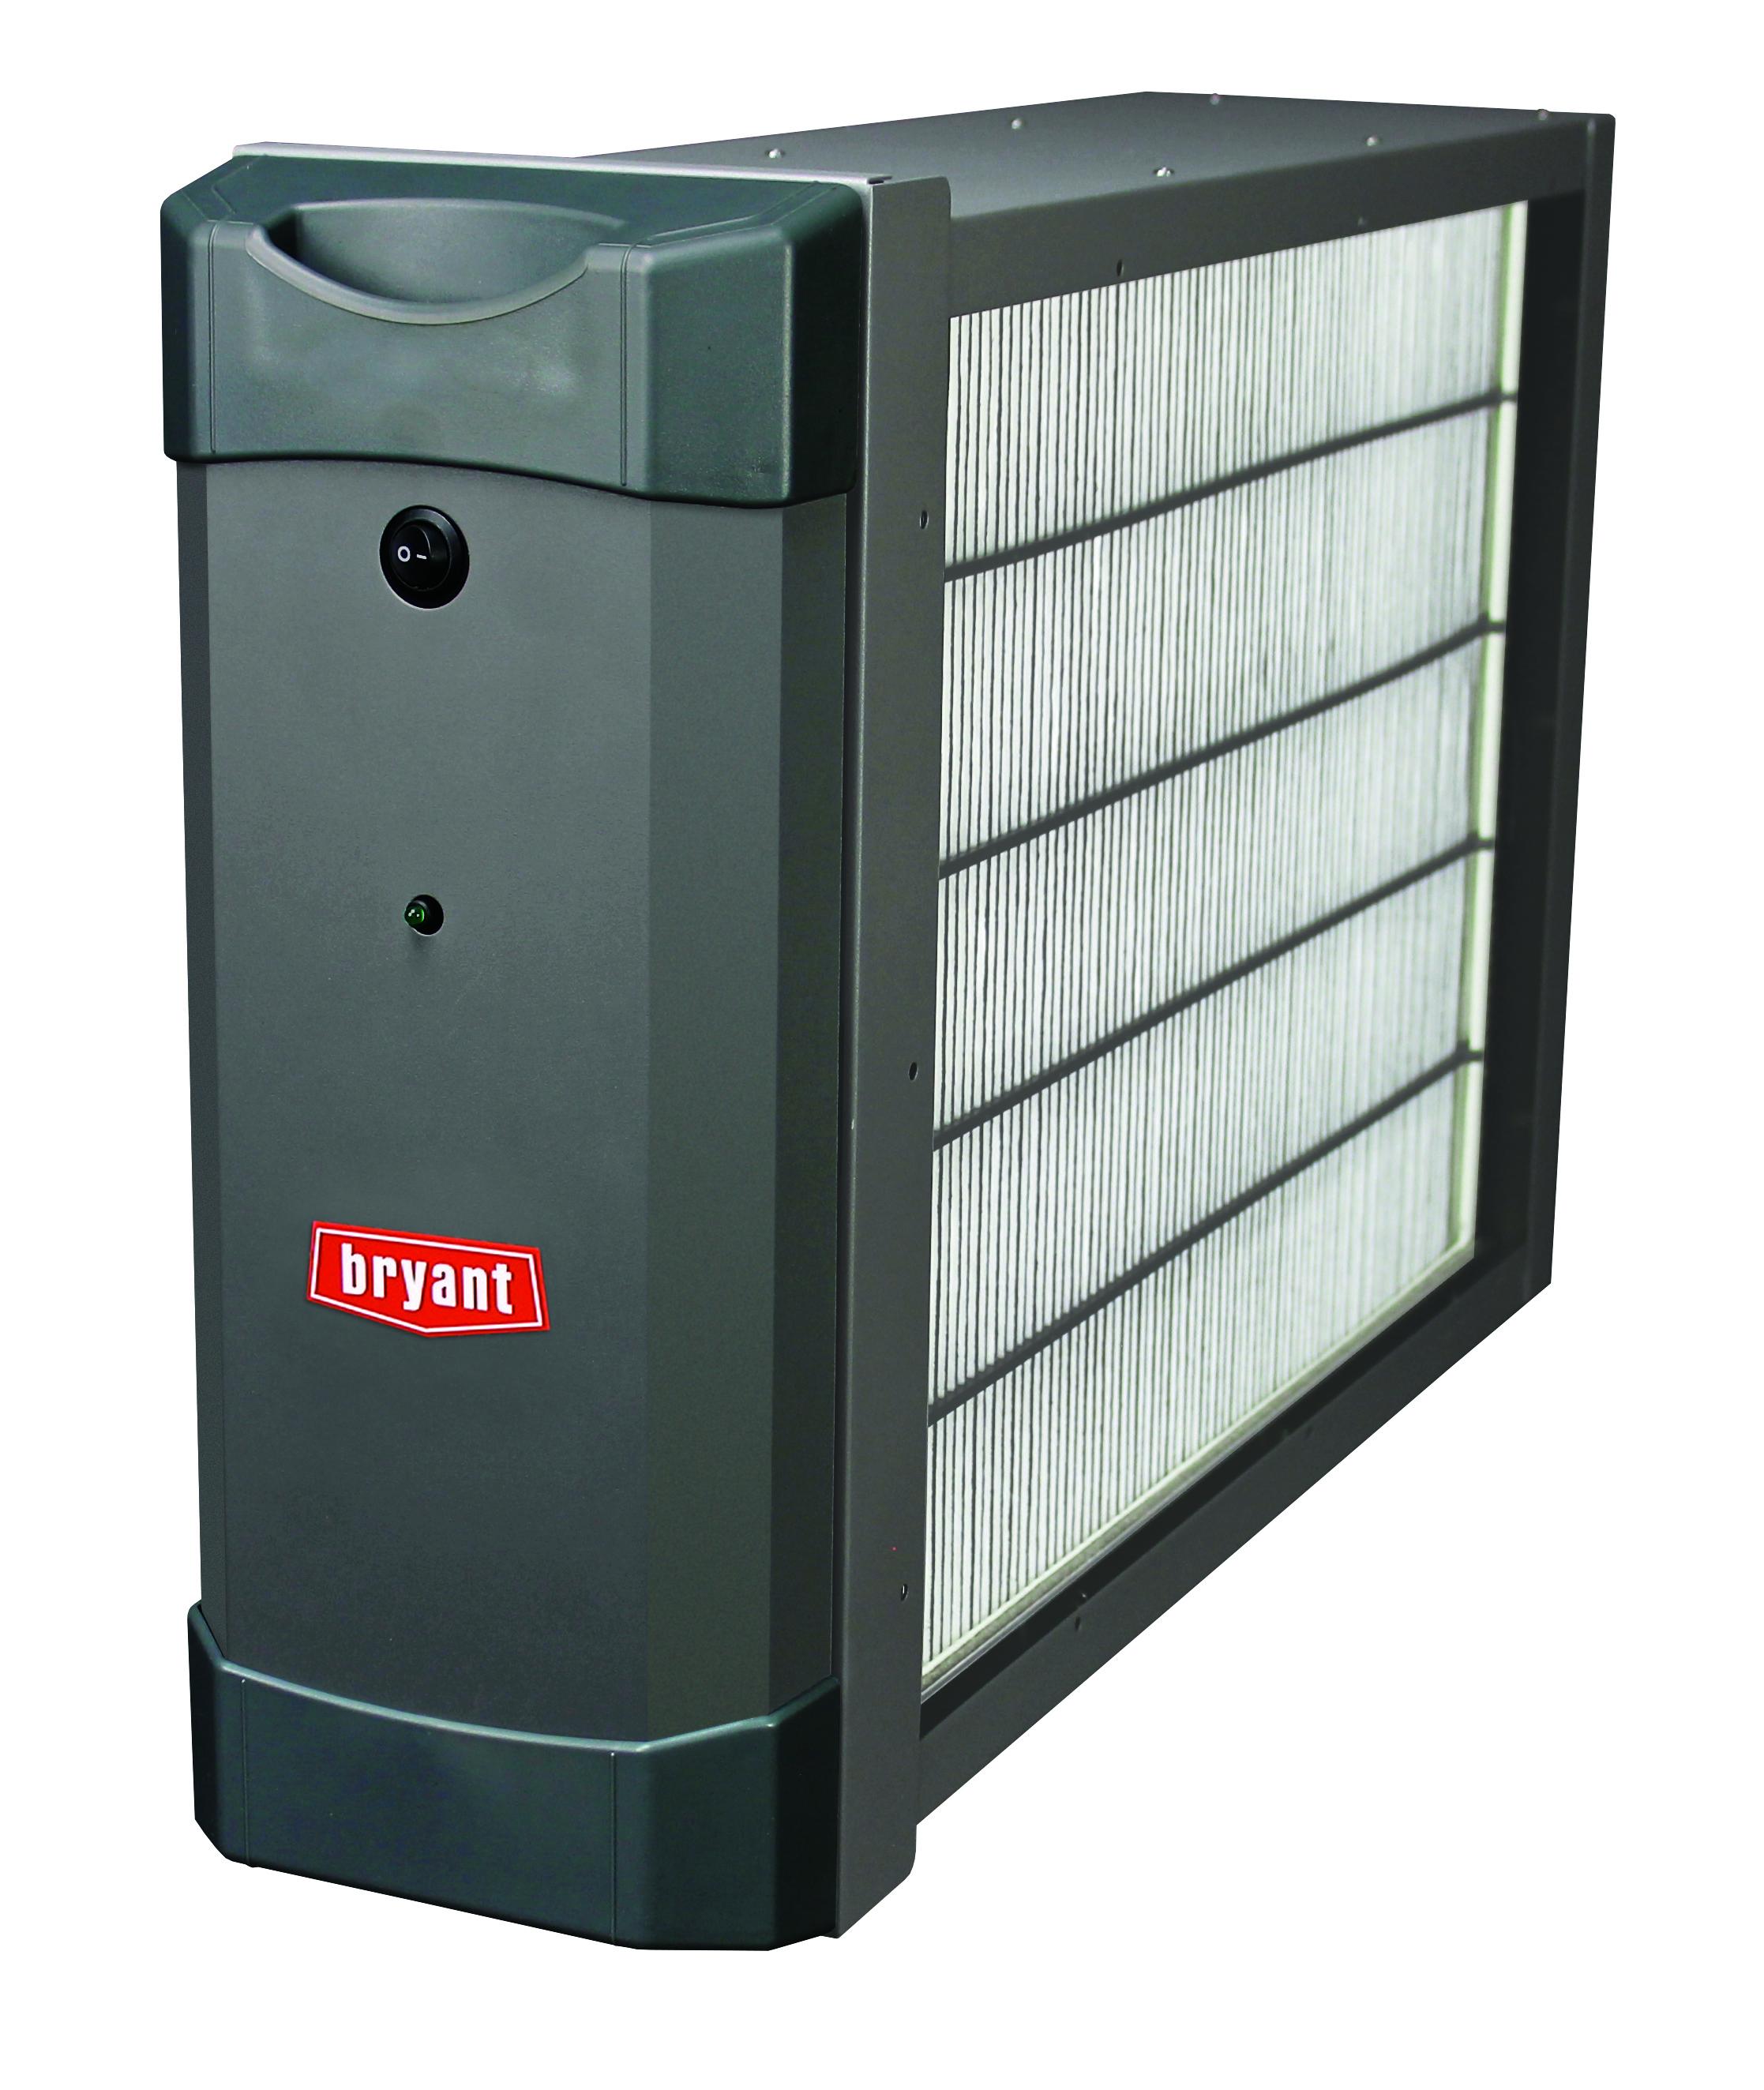 Bryant air purifier pgap